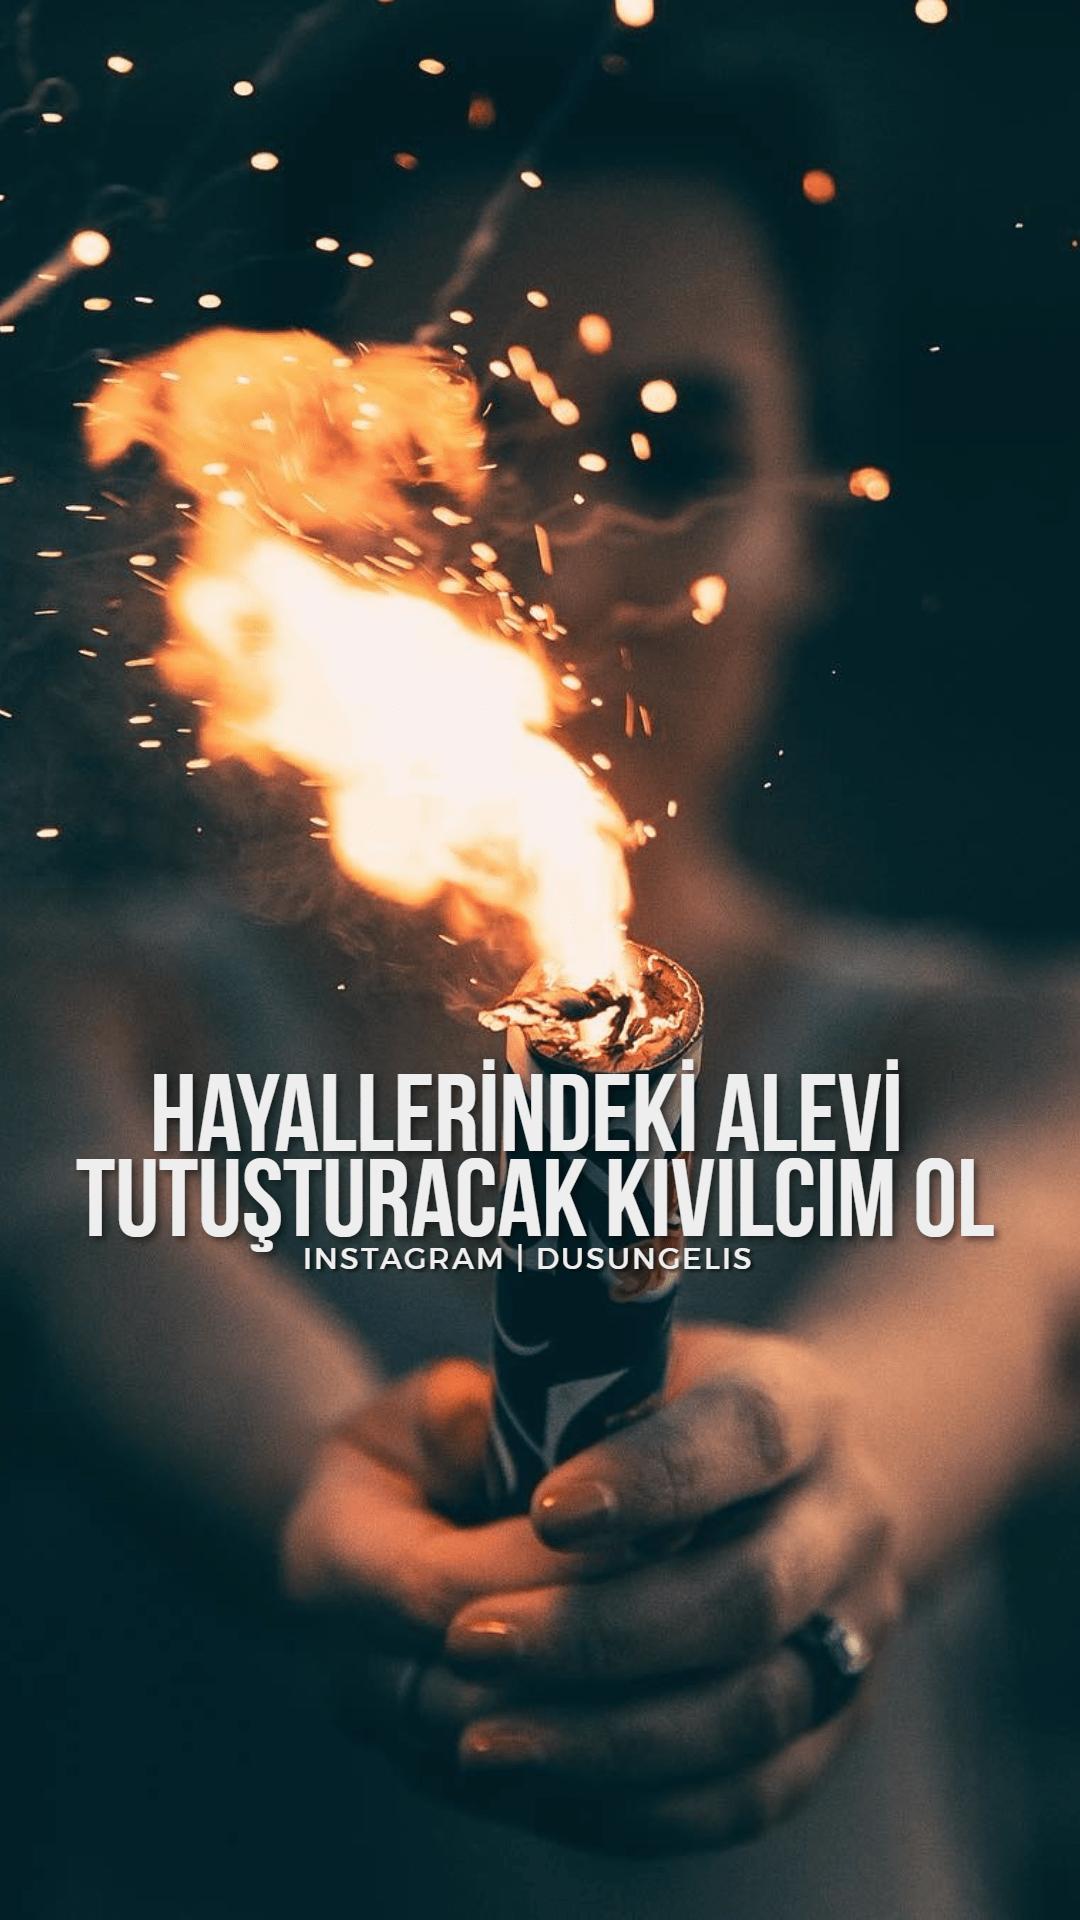 Font, Black,  Free Image